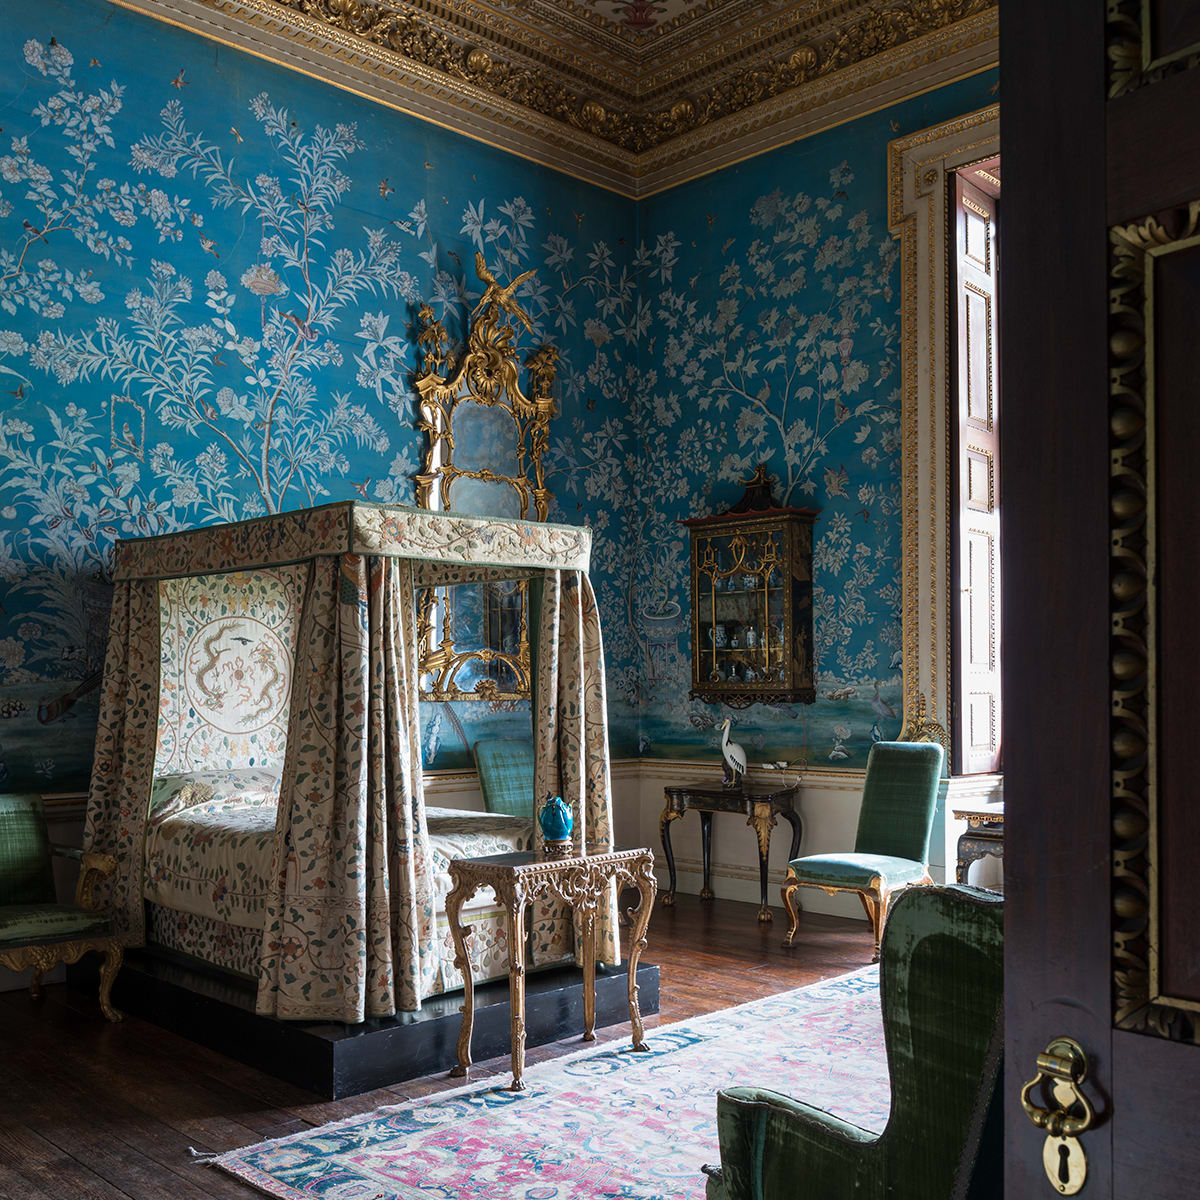 Houghton Hall MFAH Merrell - Cabinet Room